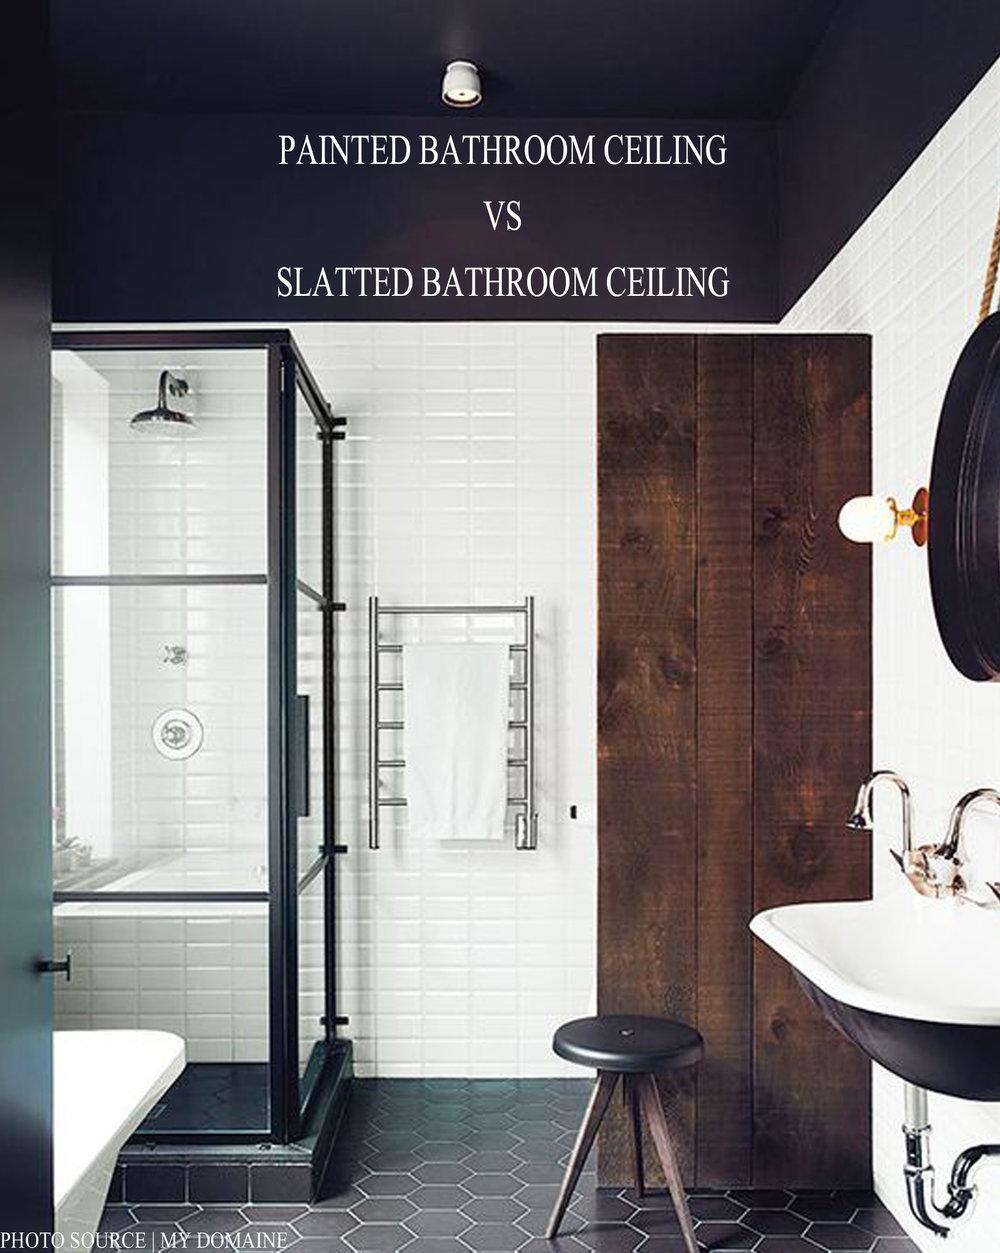 PAINTED BATHROOM CEILING VS SLATTED